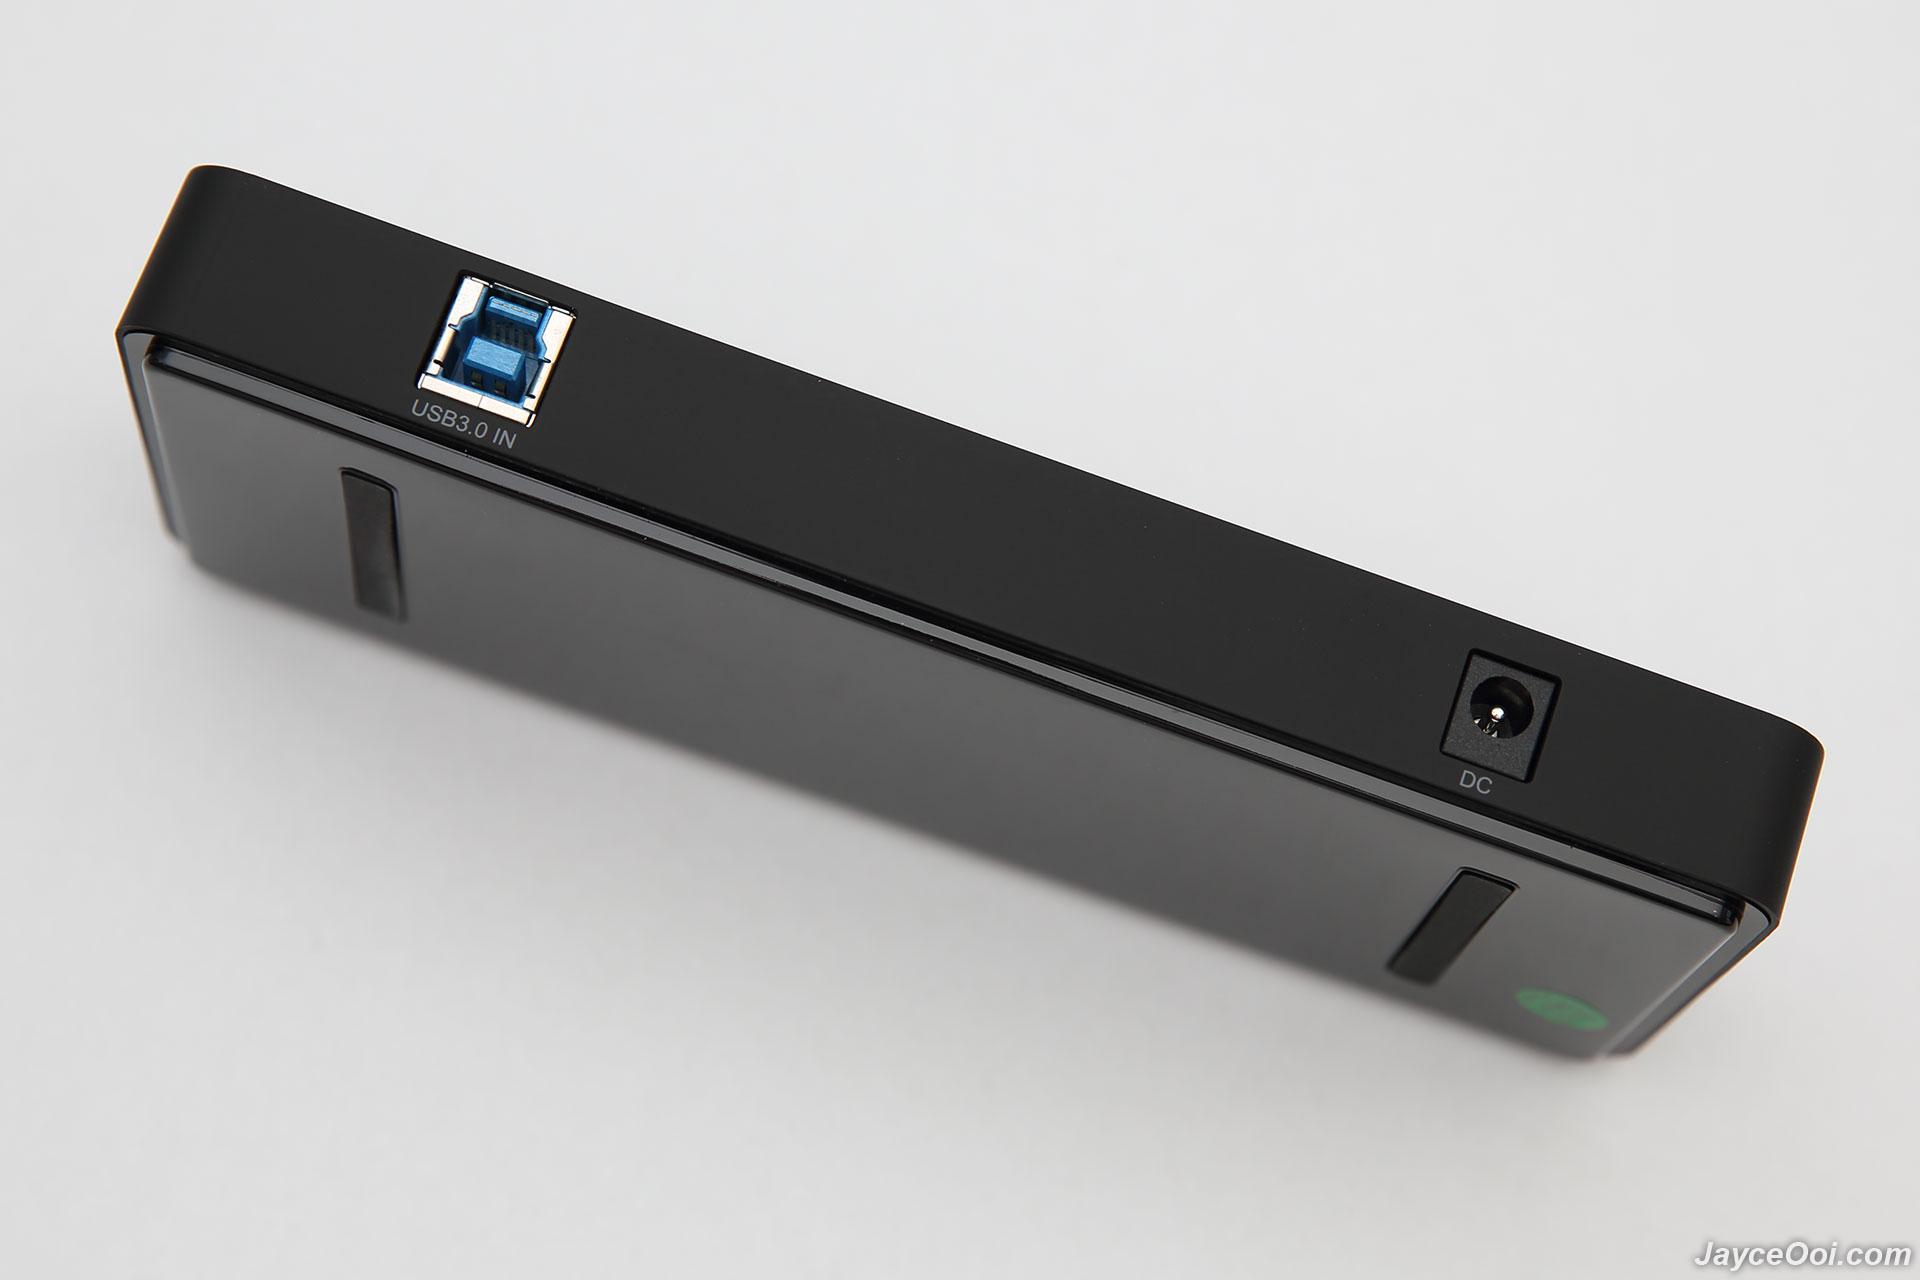 QICENT 7 Port USB 3.0 Hub Review